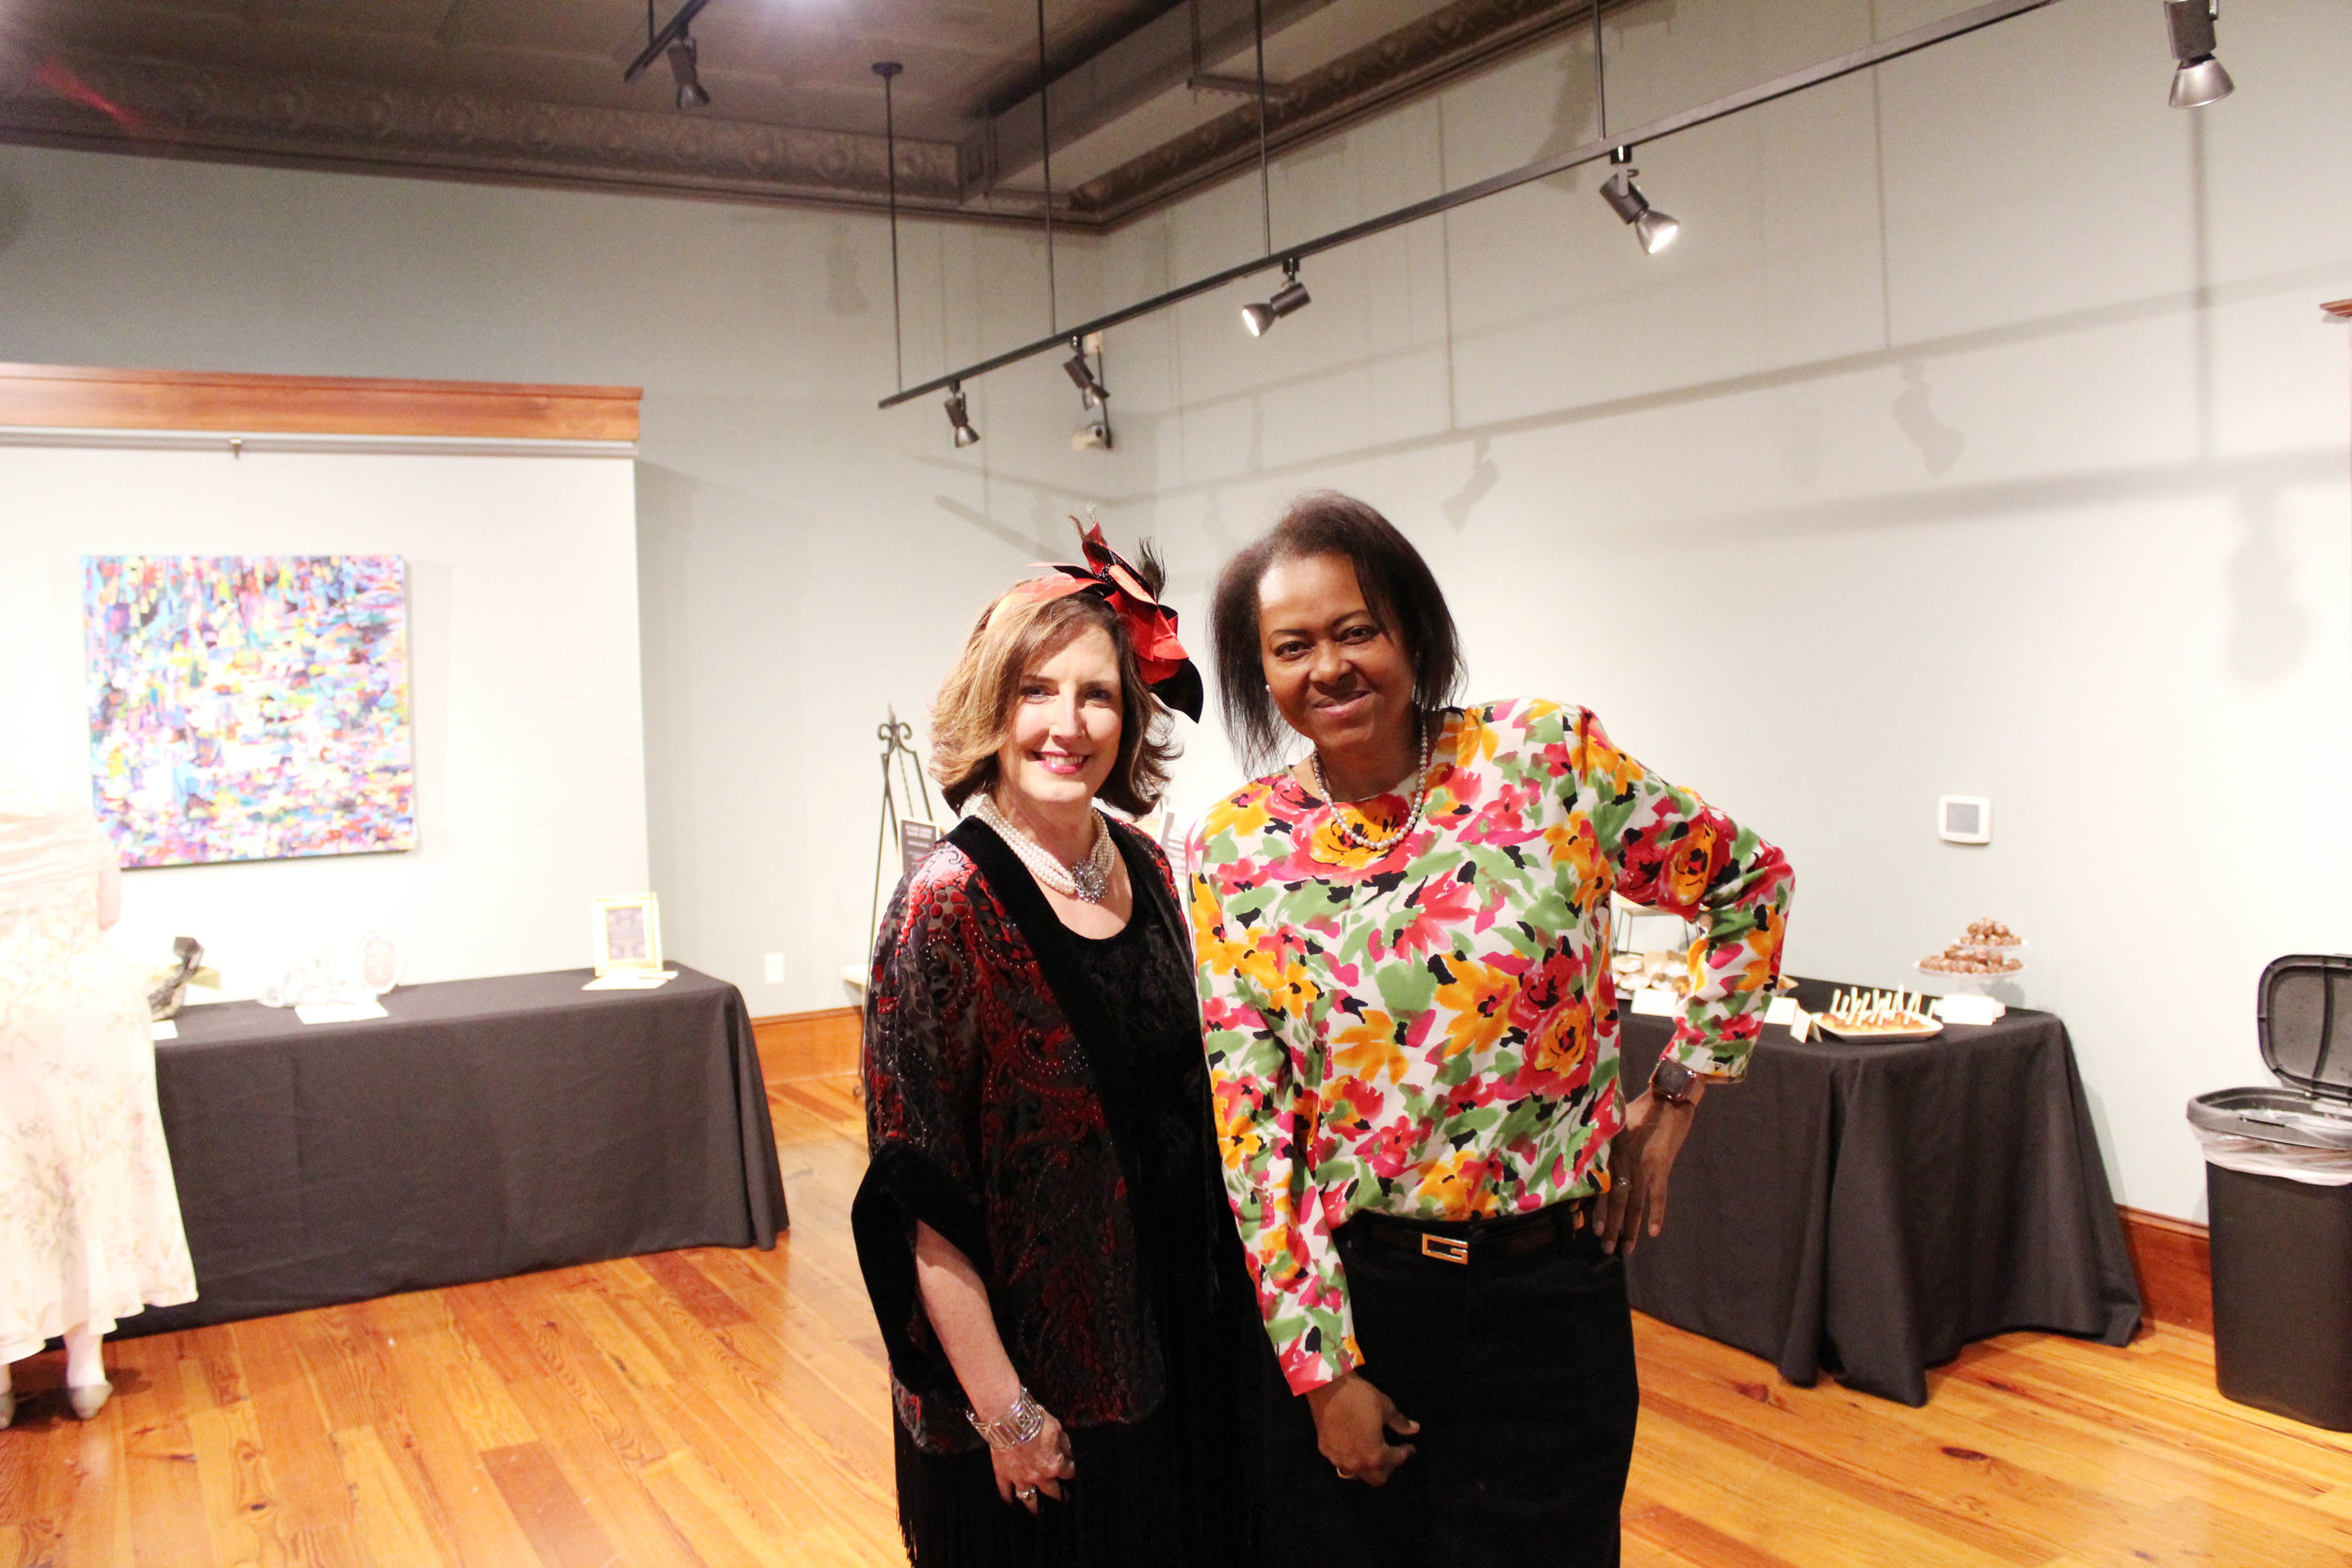 Tammie Duncan and Juanita Roberson